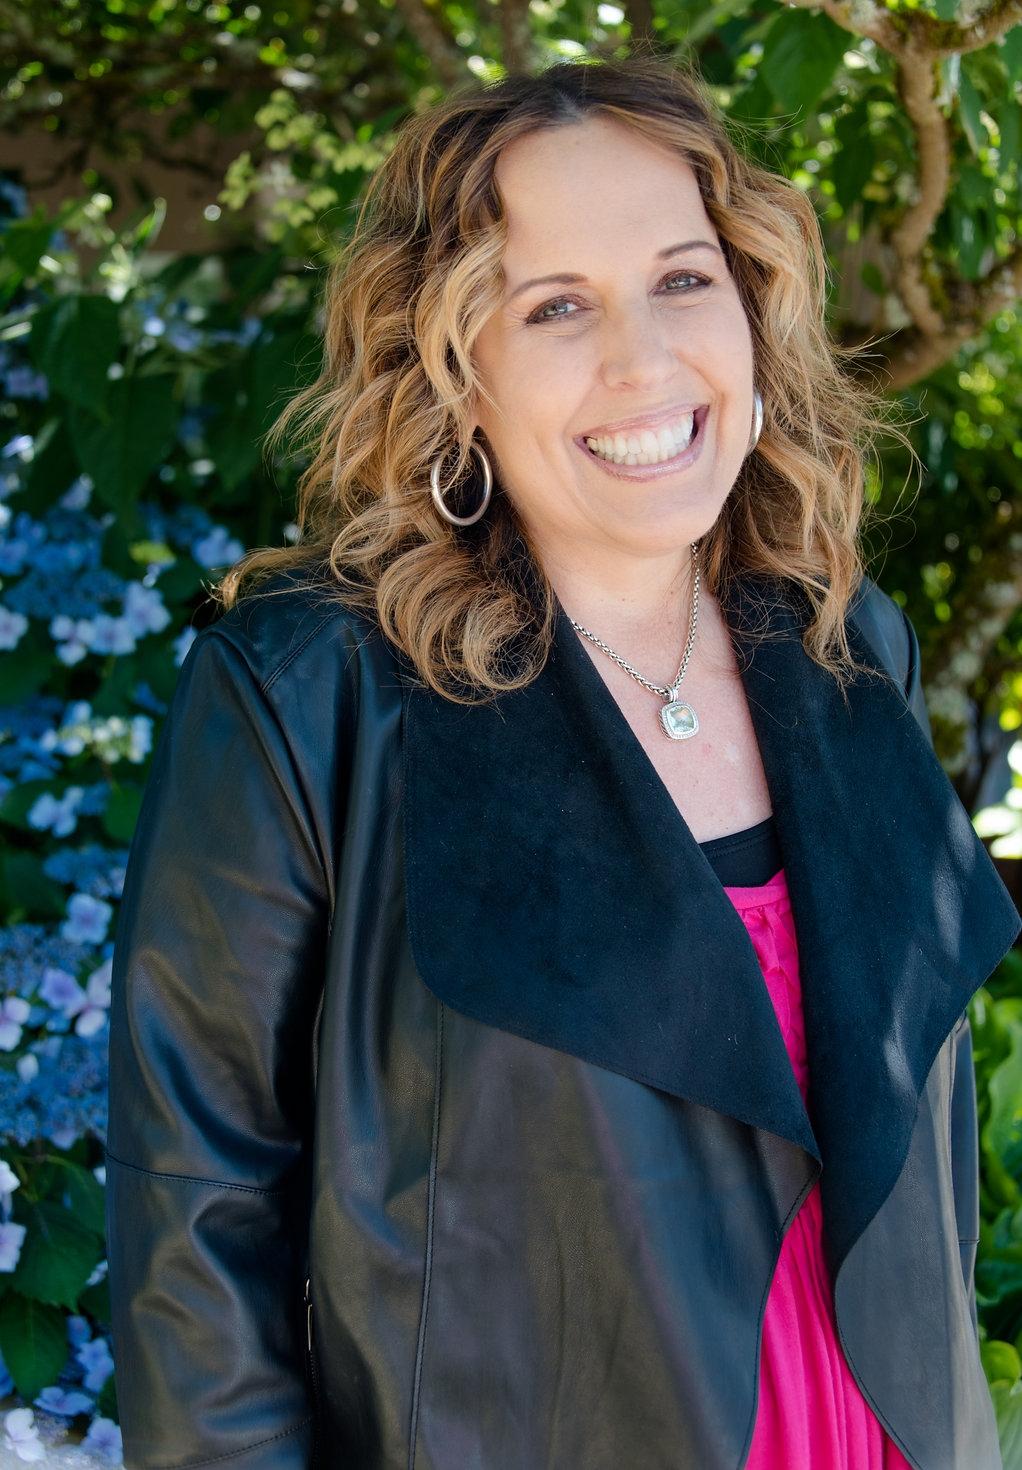 Lori Lassen,B.A., J.D., N.H.A. - Executive Director / Owner